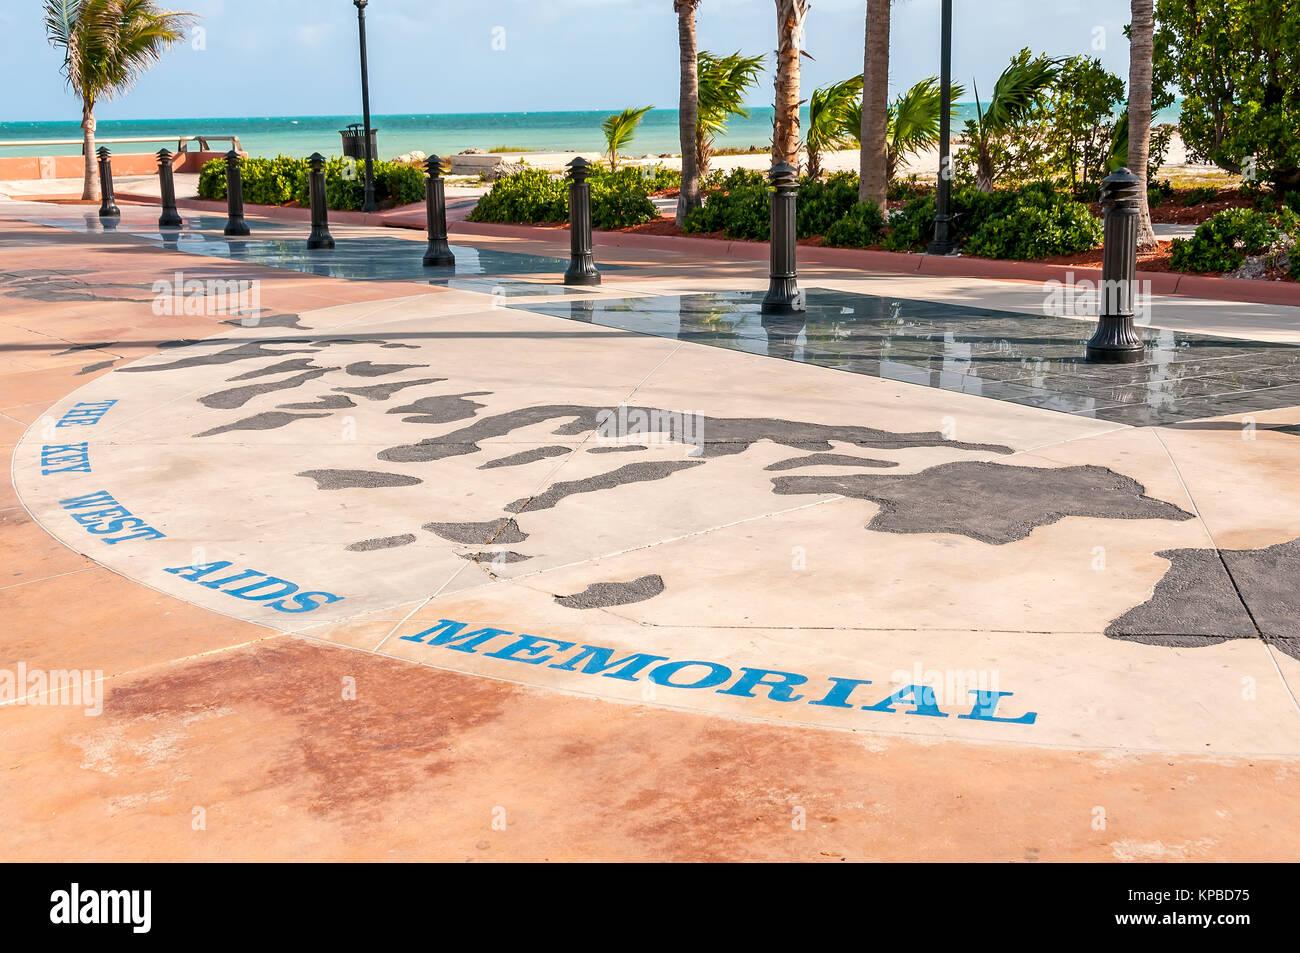 The Key West Aids Memorial at Higgs Memorial Beach, Key West, Florida - Stock Image